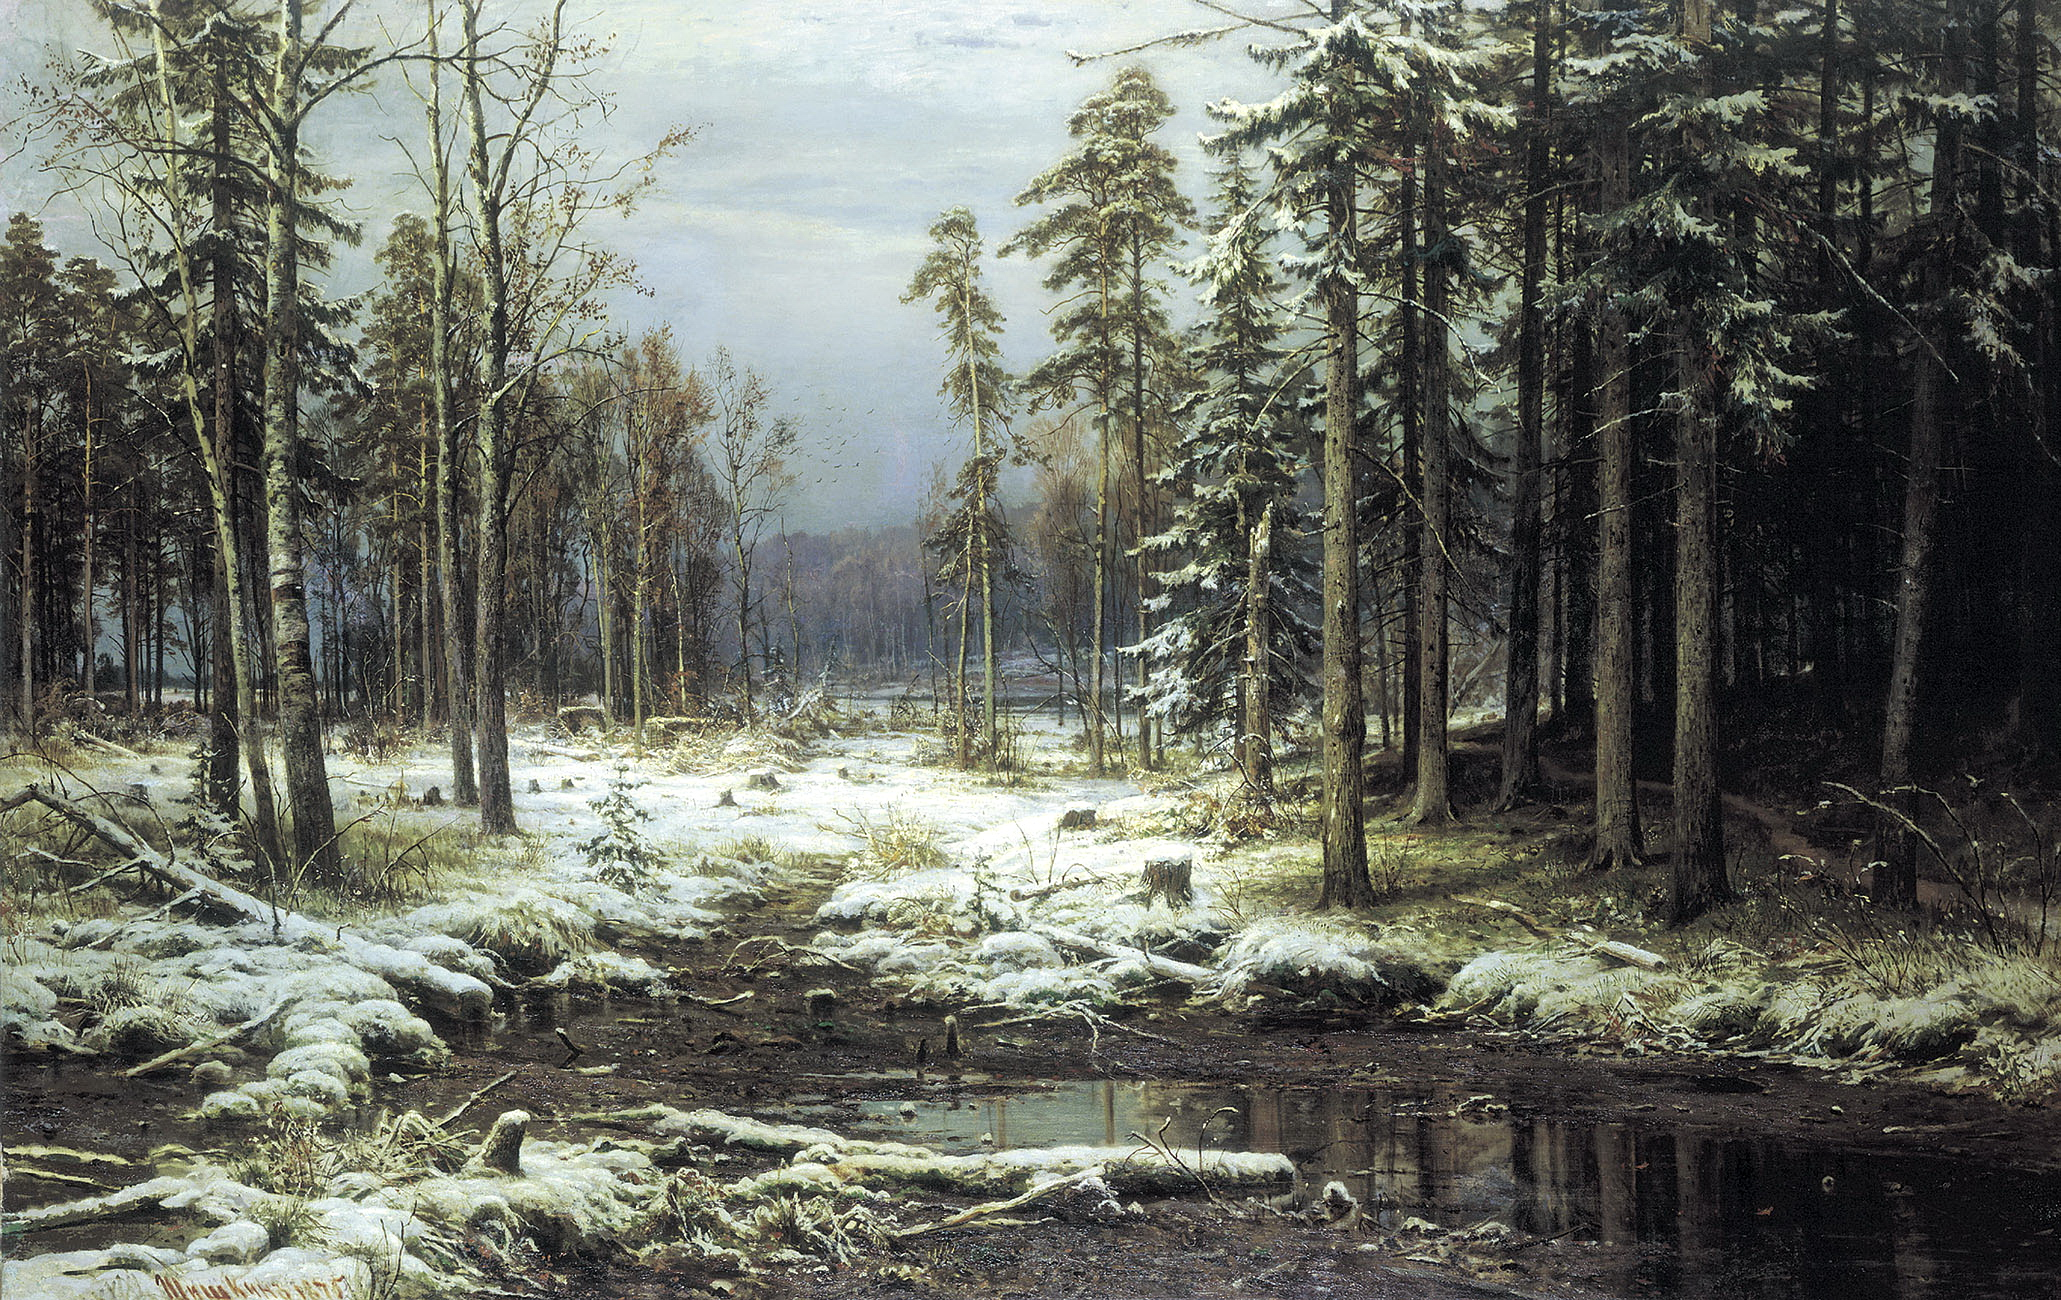 Иван Шишкин картина Первый снег зимний пейзаж холст масло